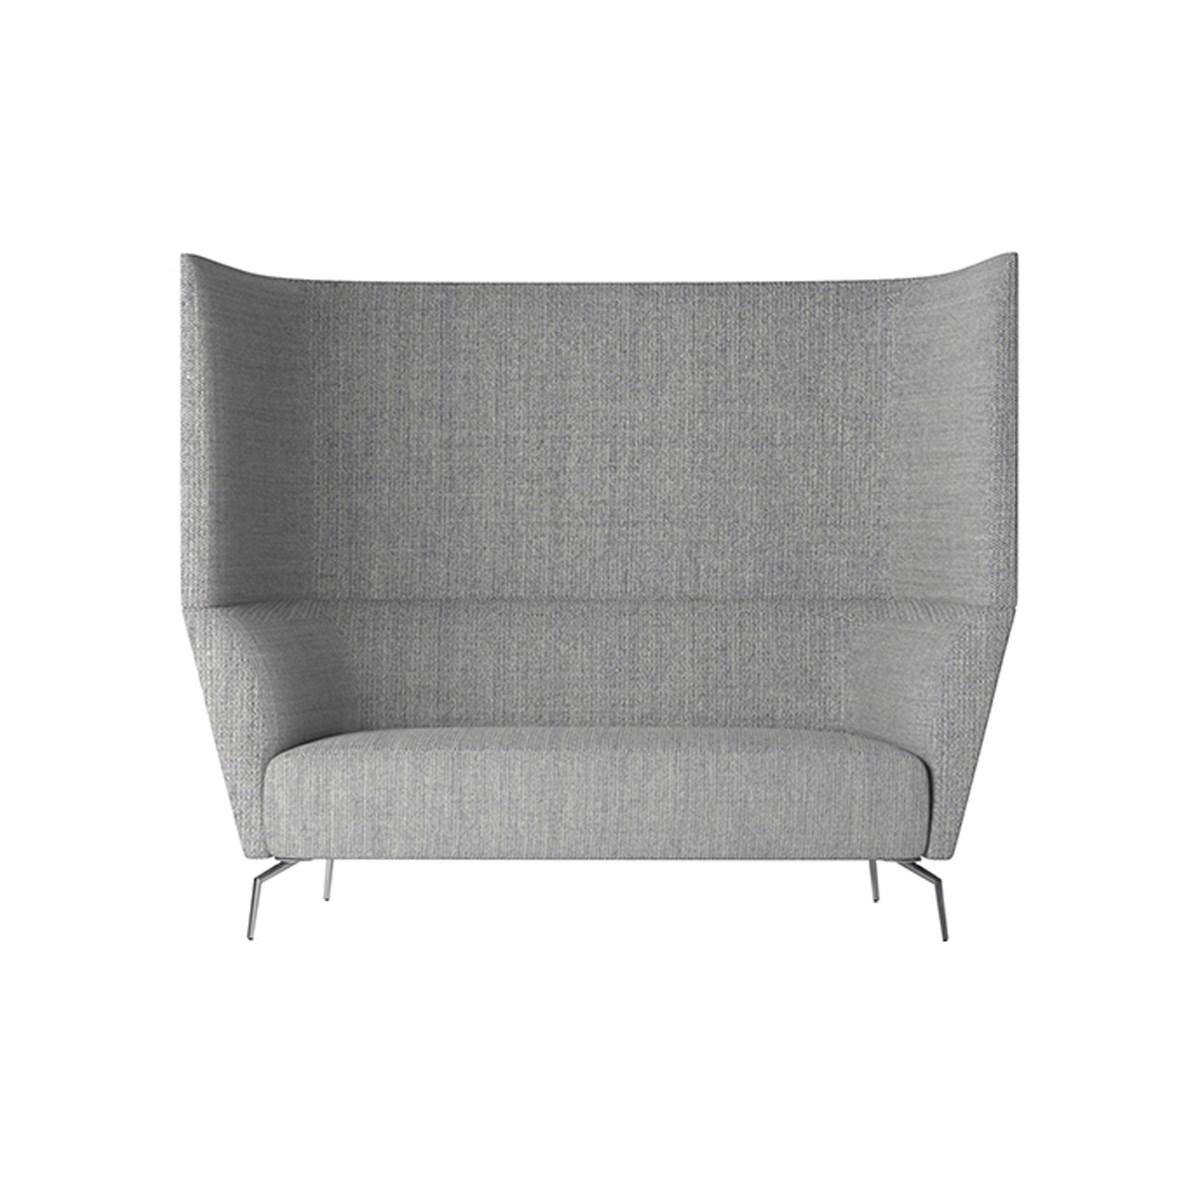 Neospace-Ridgeway-Sofa-System-Contract-Matisse-2